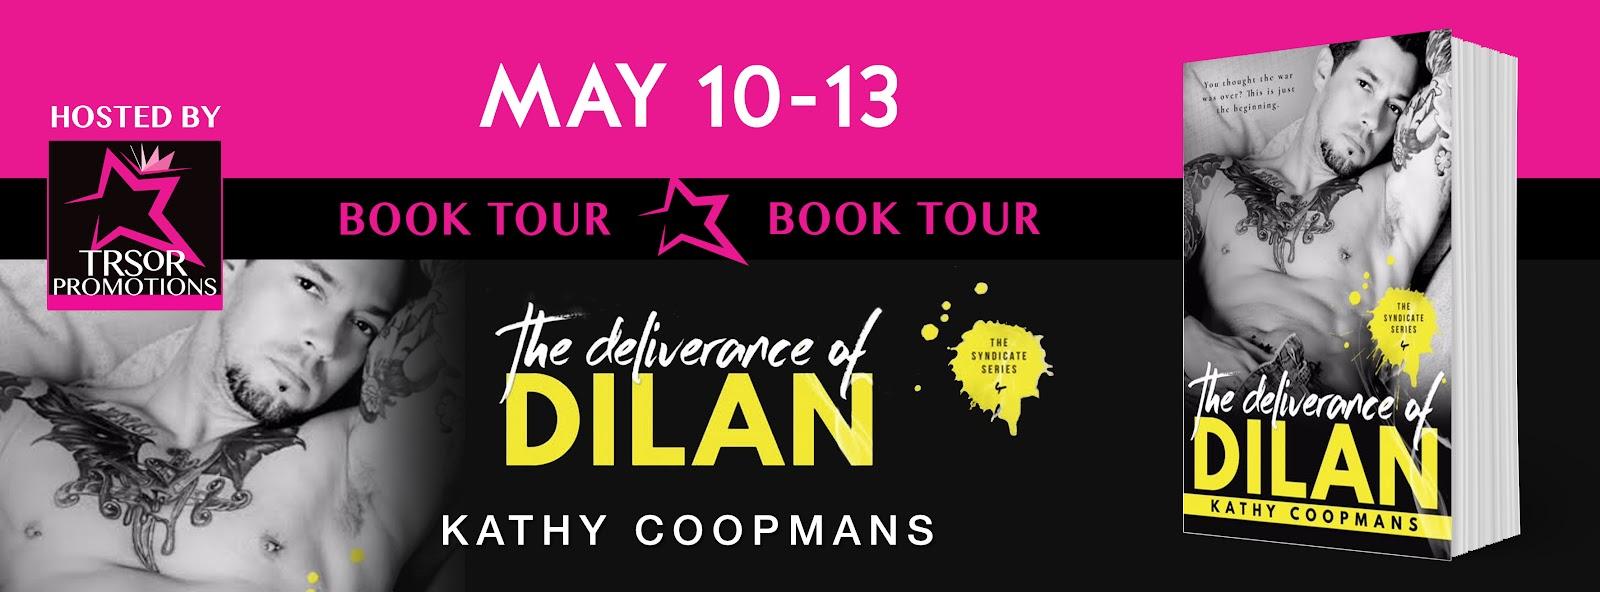 DELIVERANCE_DILAN_BOOK_TOUR.jpg